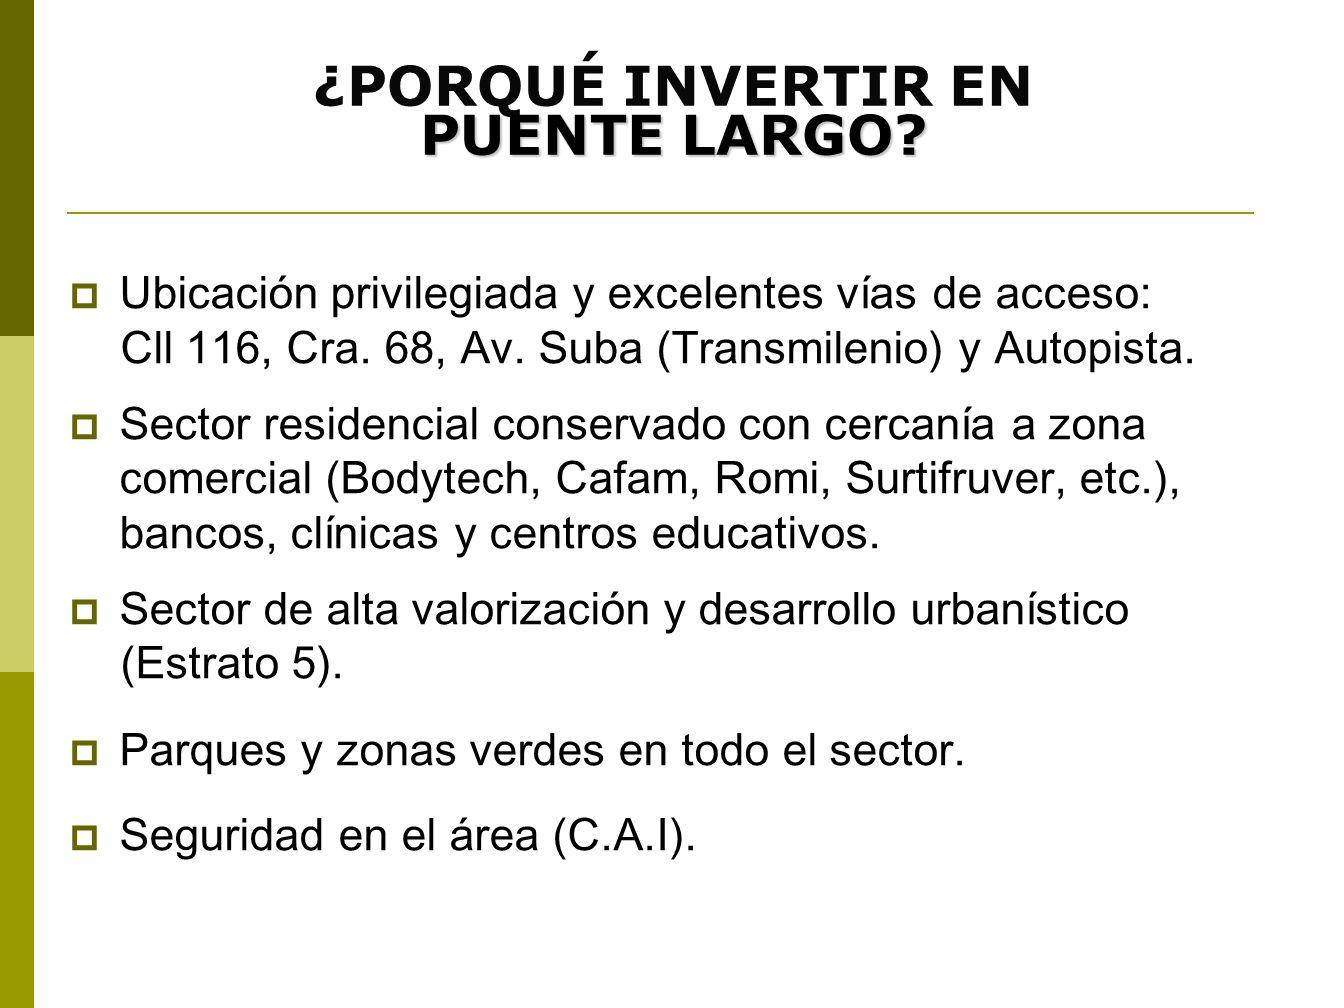 MONTEVERDI 104 PRIVILEGIOS DE INVERTIR EN MONTEVERDI 104 Apartamentos desde 60 hasta 96 m 2.